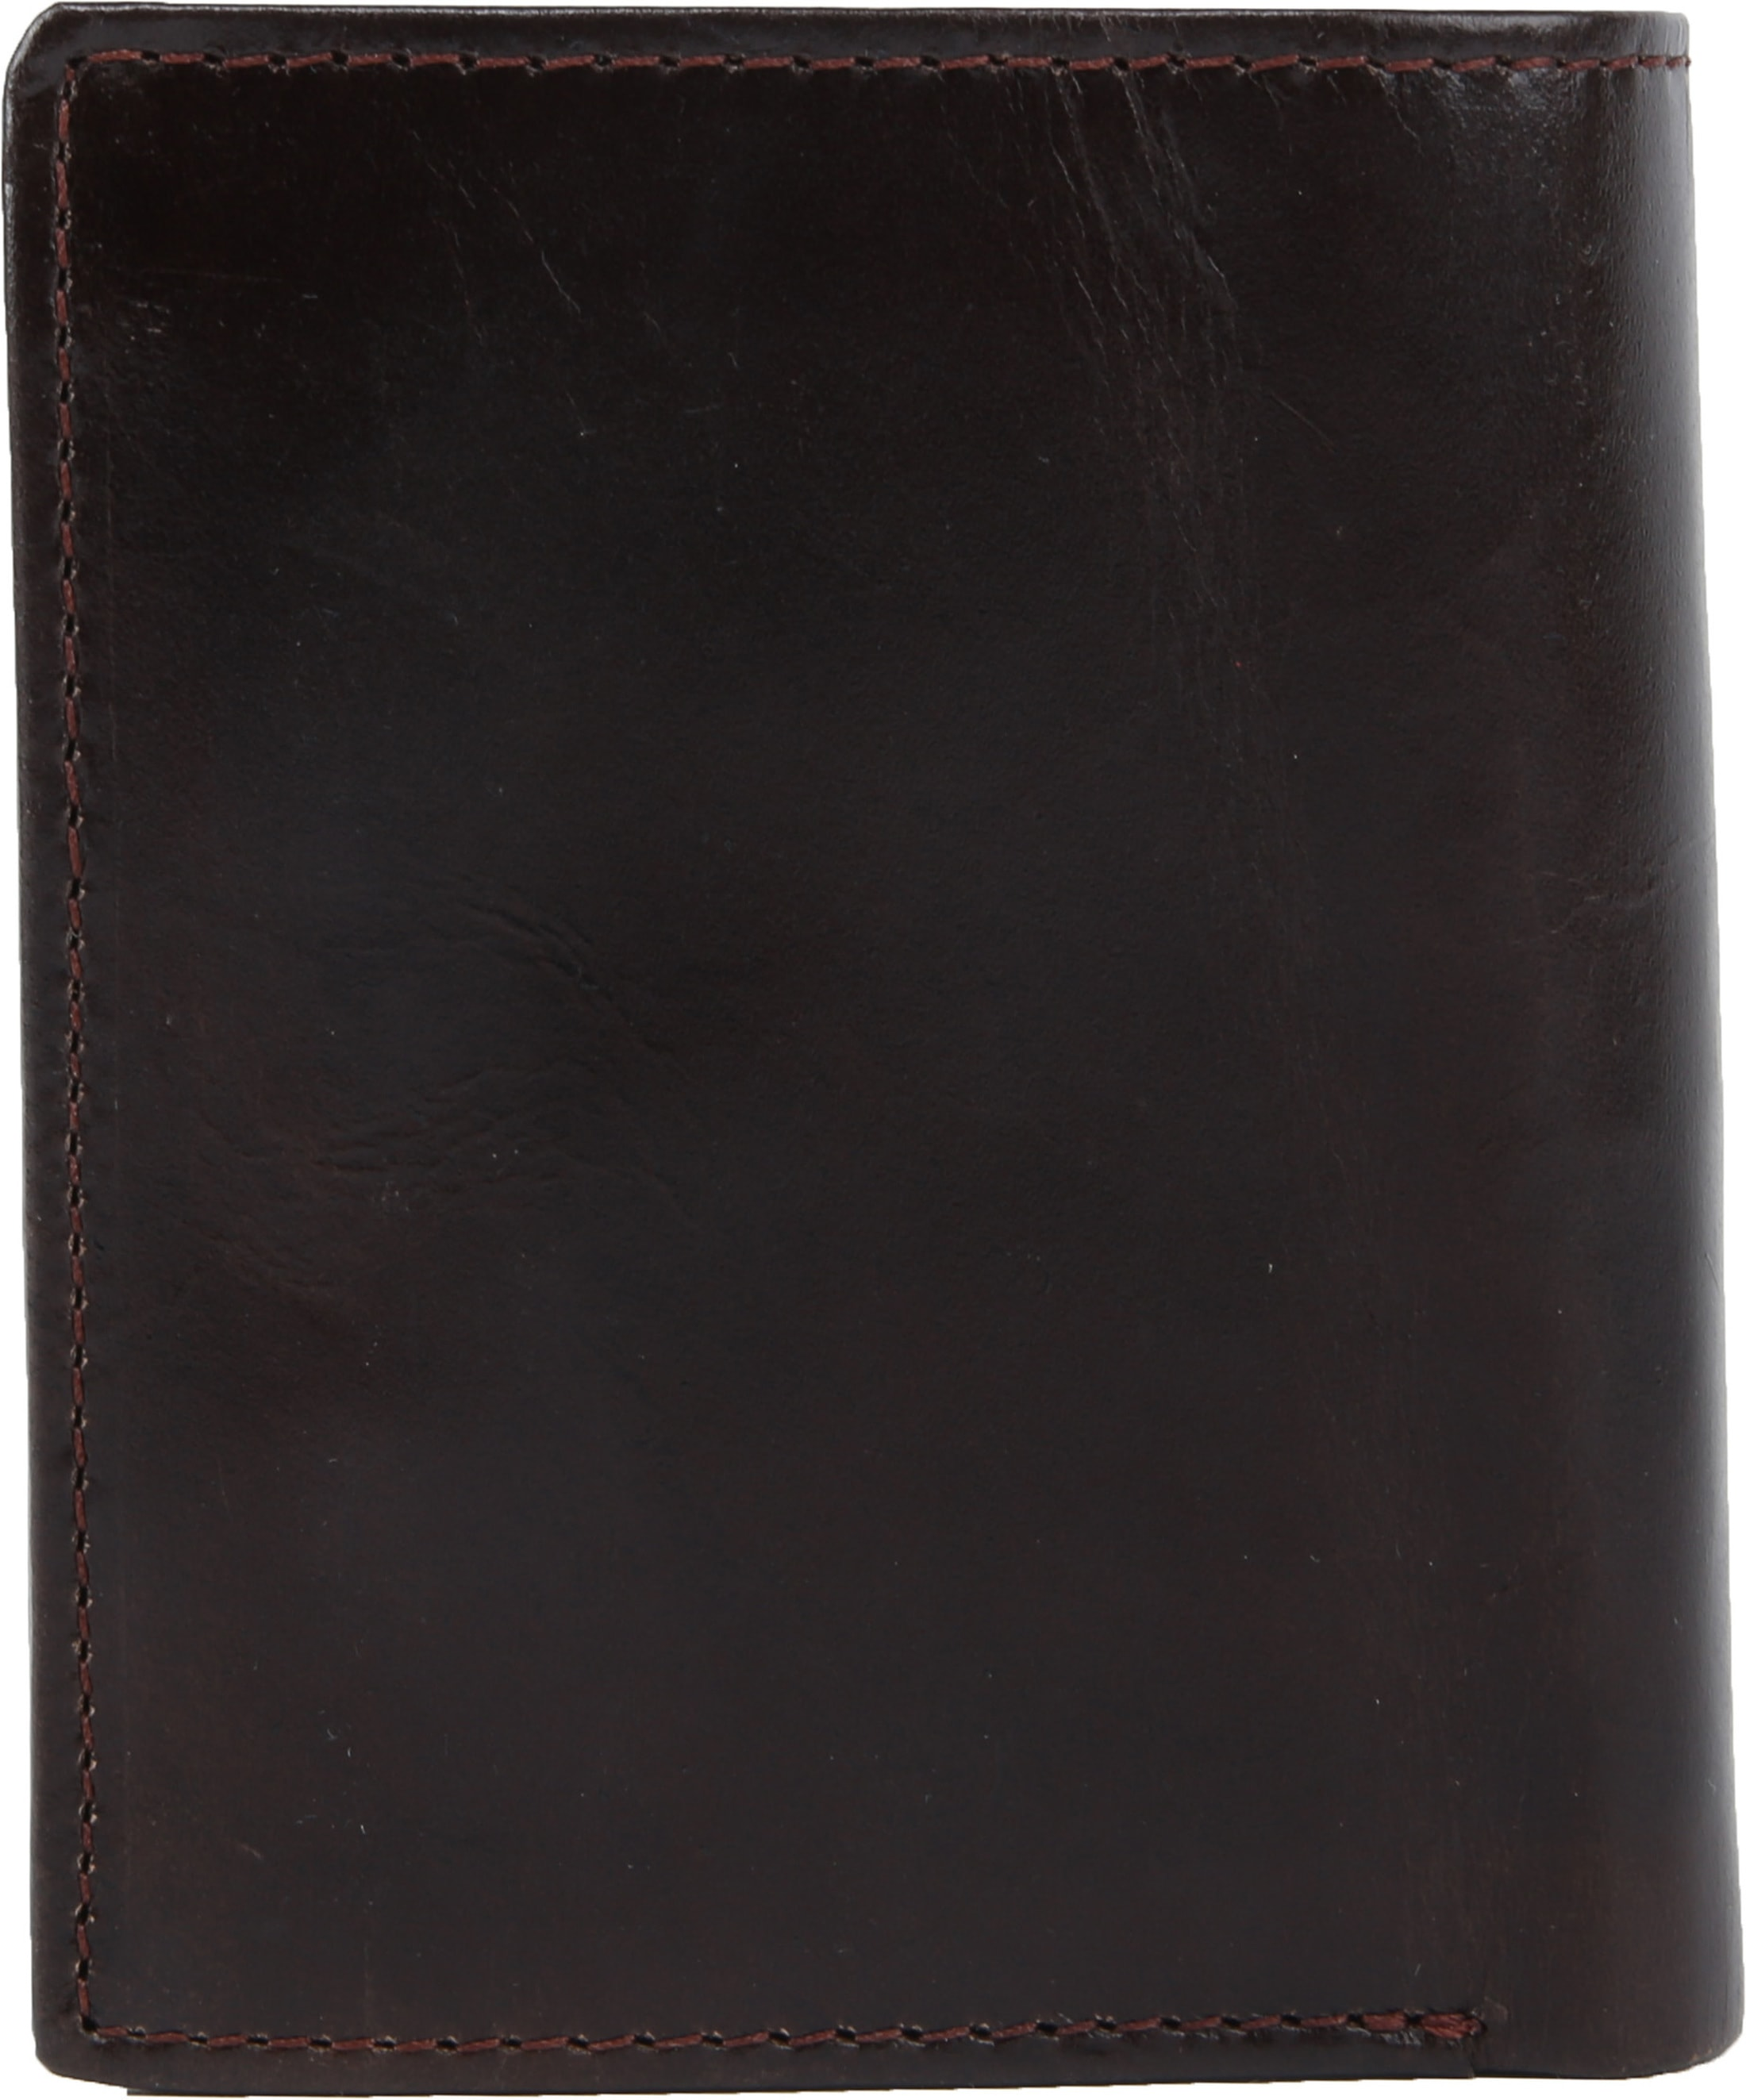 Suitable Wallet Nikkei Dark Brown Leather - Skim Proof